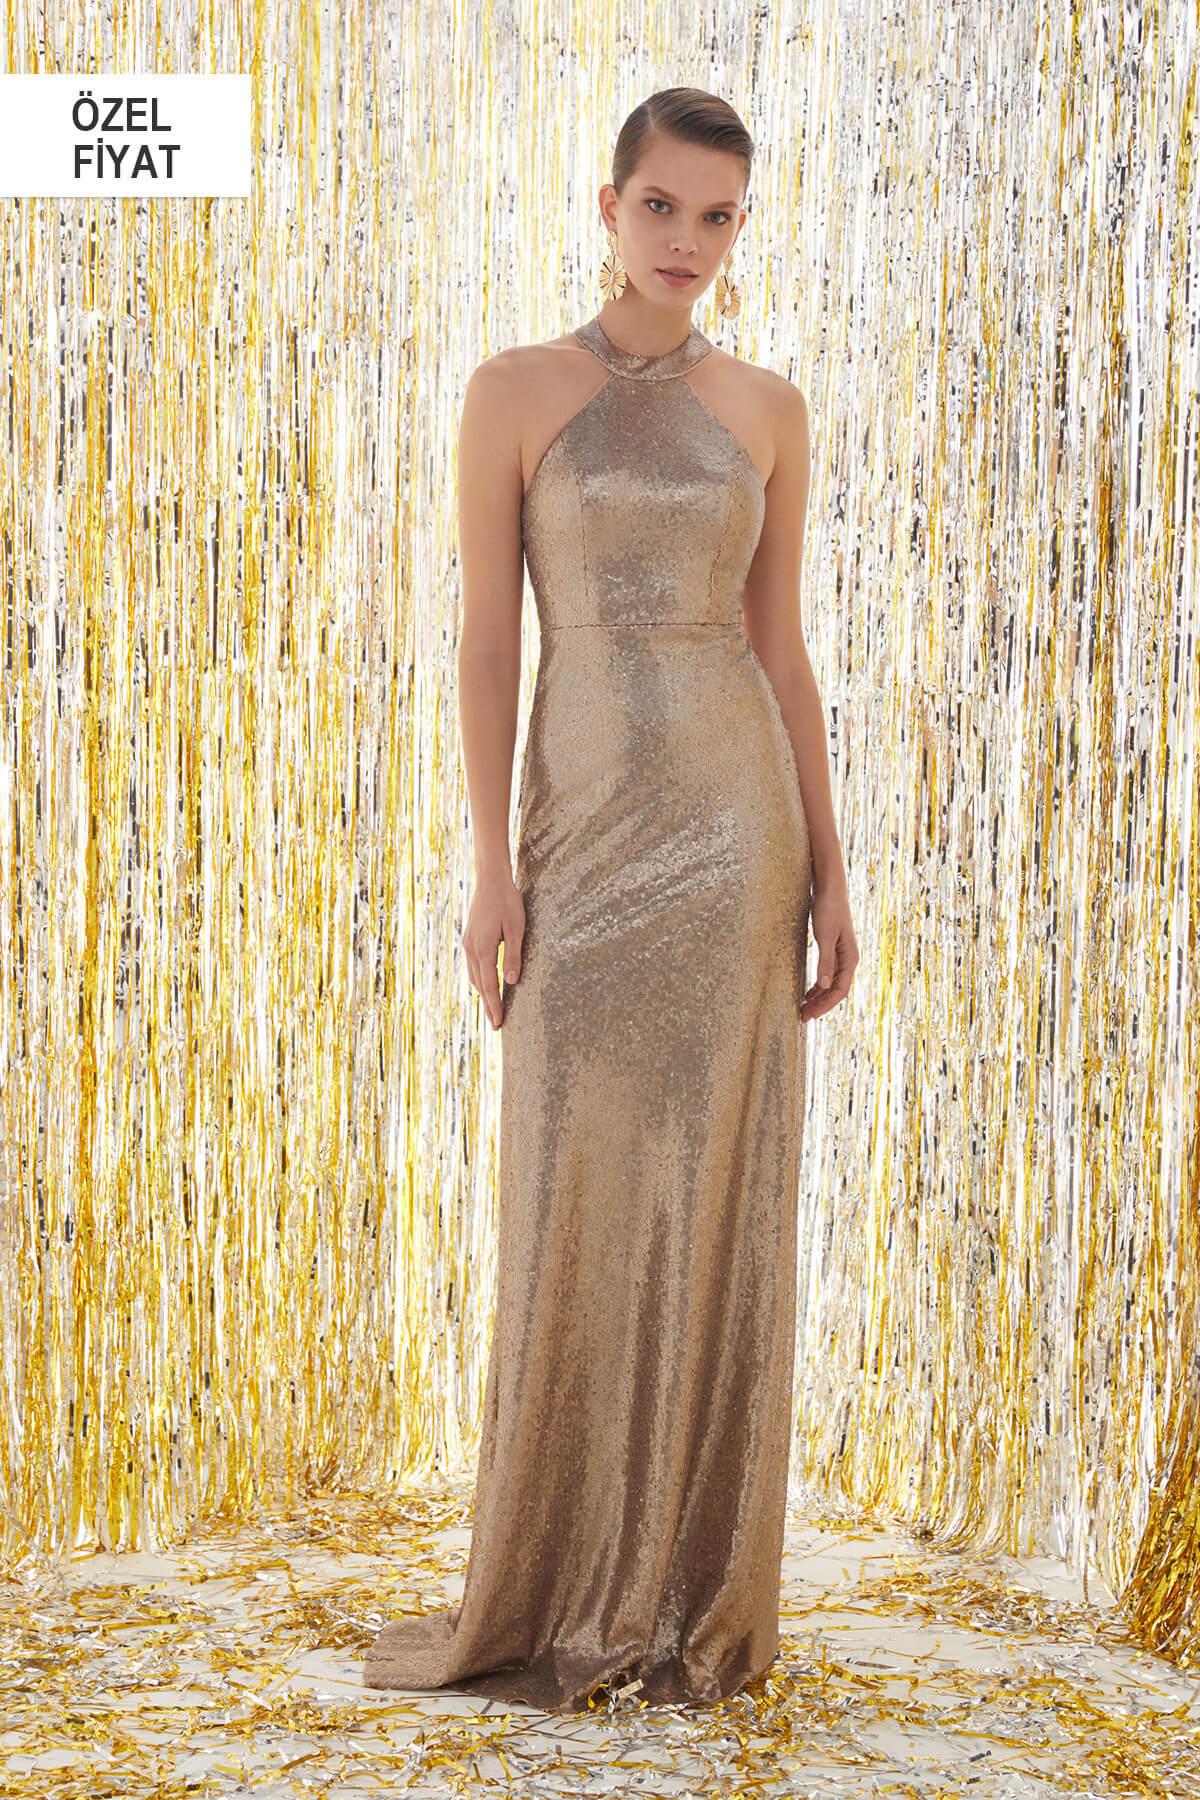 8e6e9f0a0be4e Oleg Cassini Kadın Altın Rengi Halter Yaka Abiye Elbise 4XLVC3772V1 ...